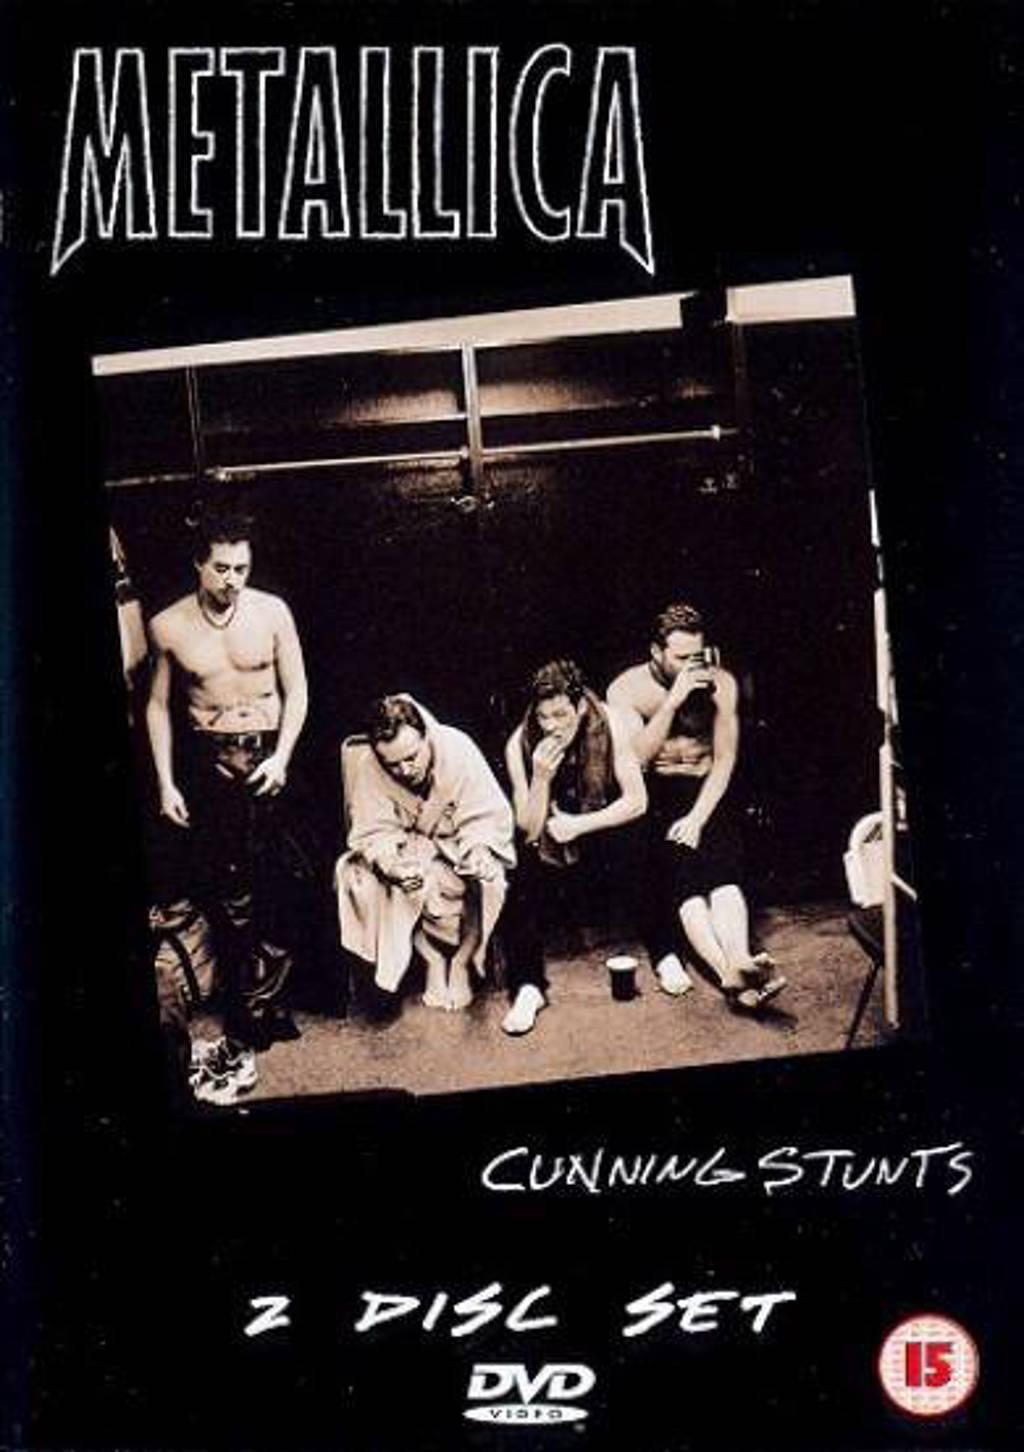 Metallica - Cunning Stunts  (DVD)